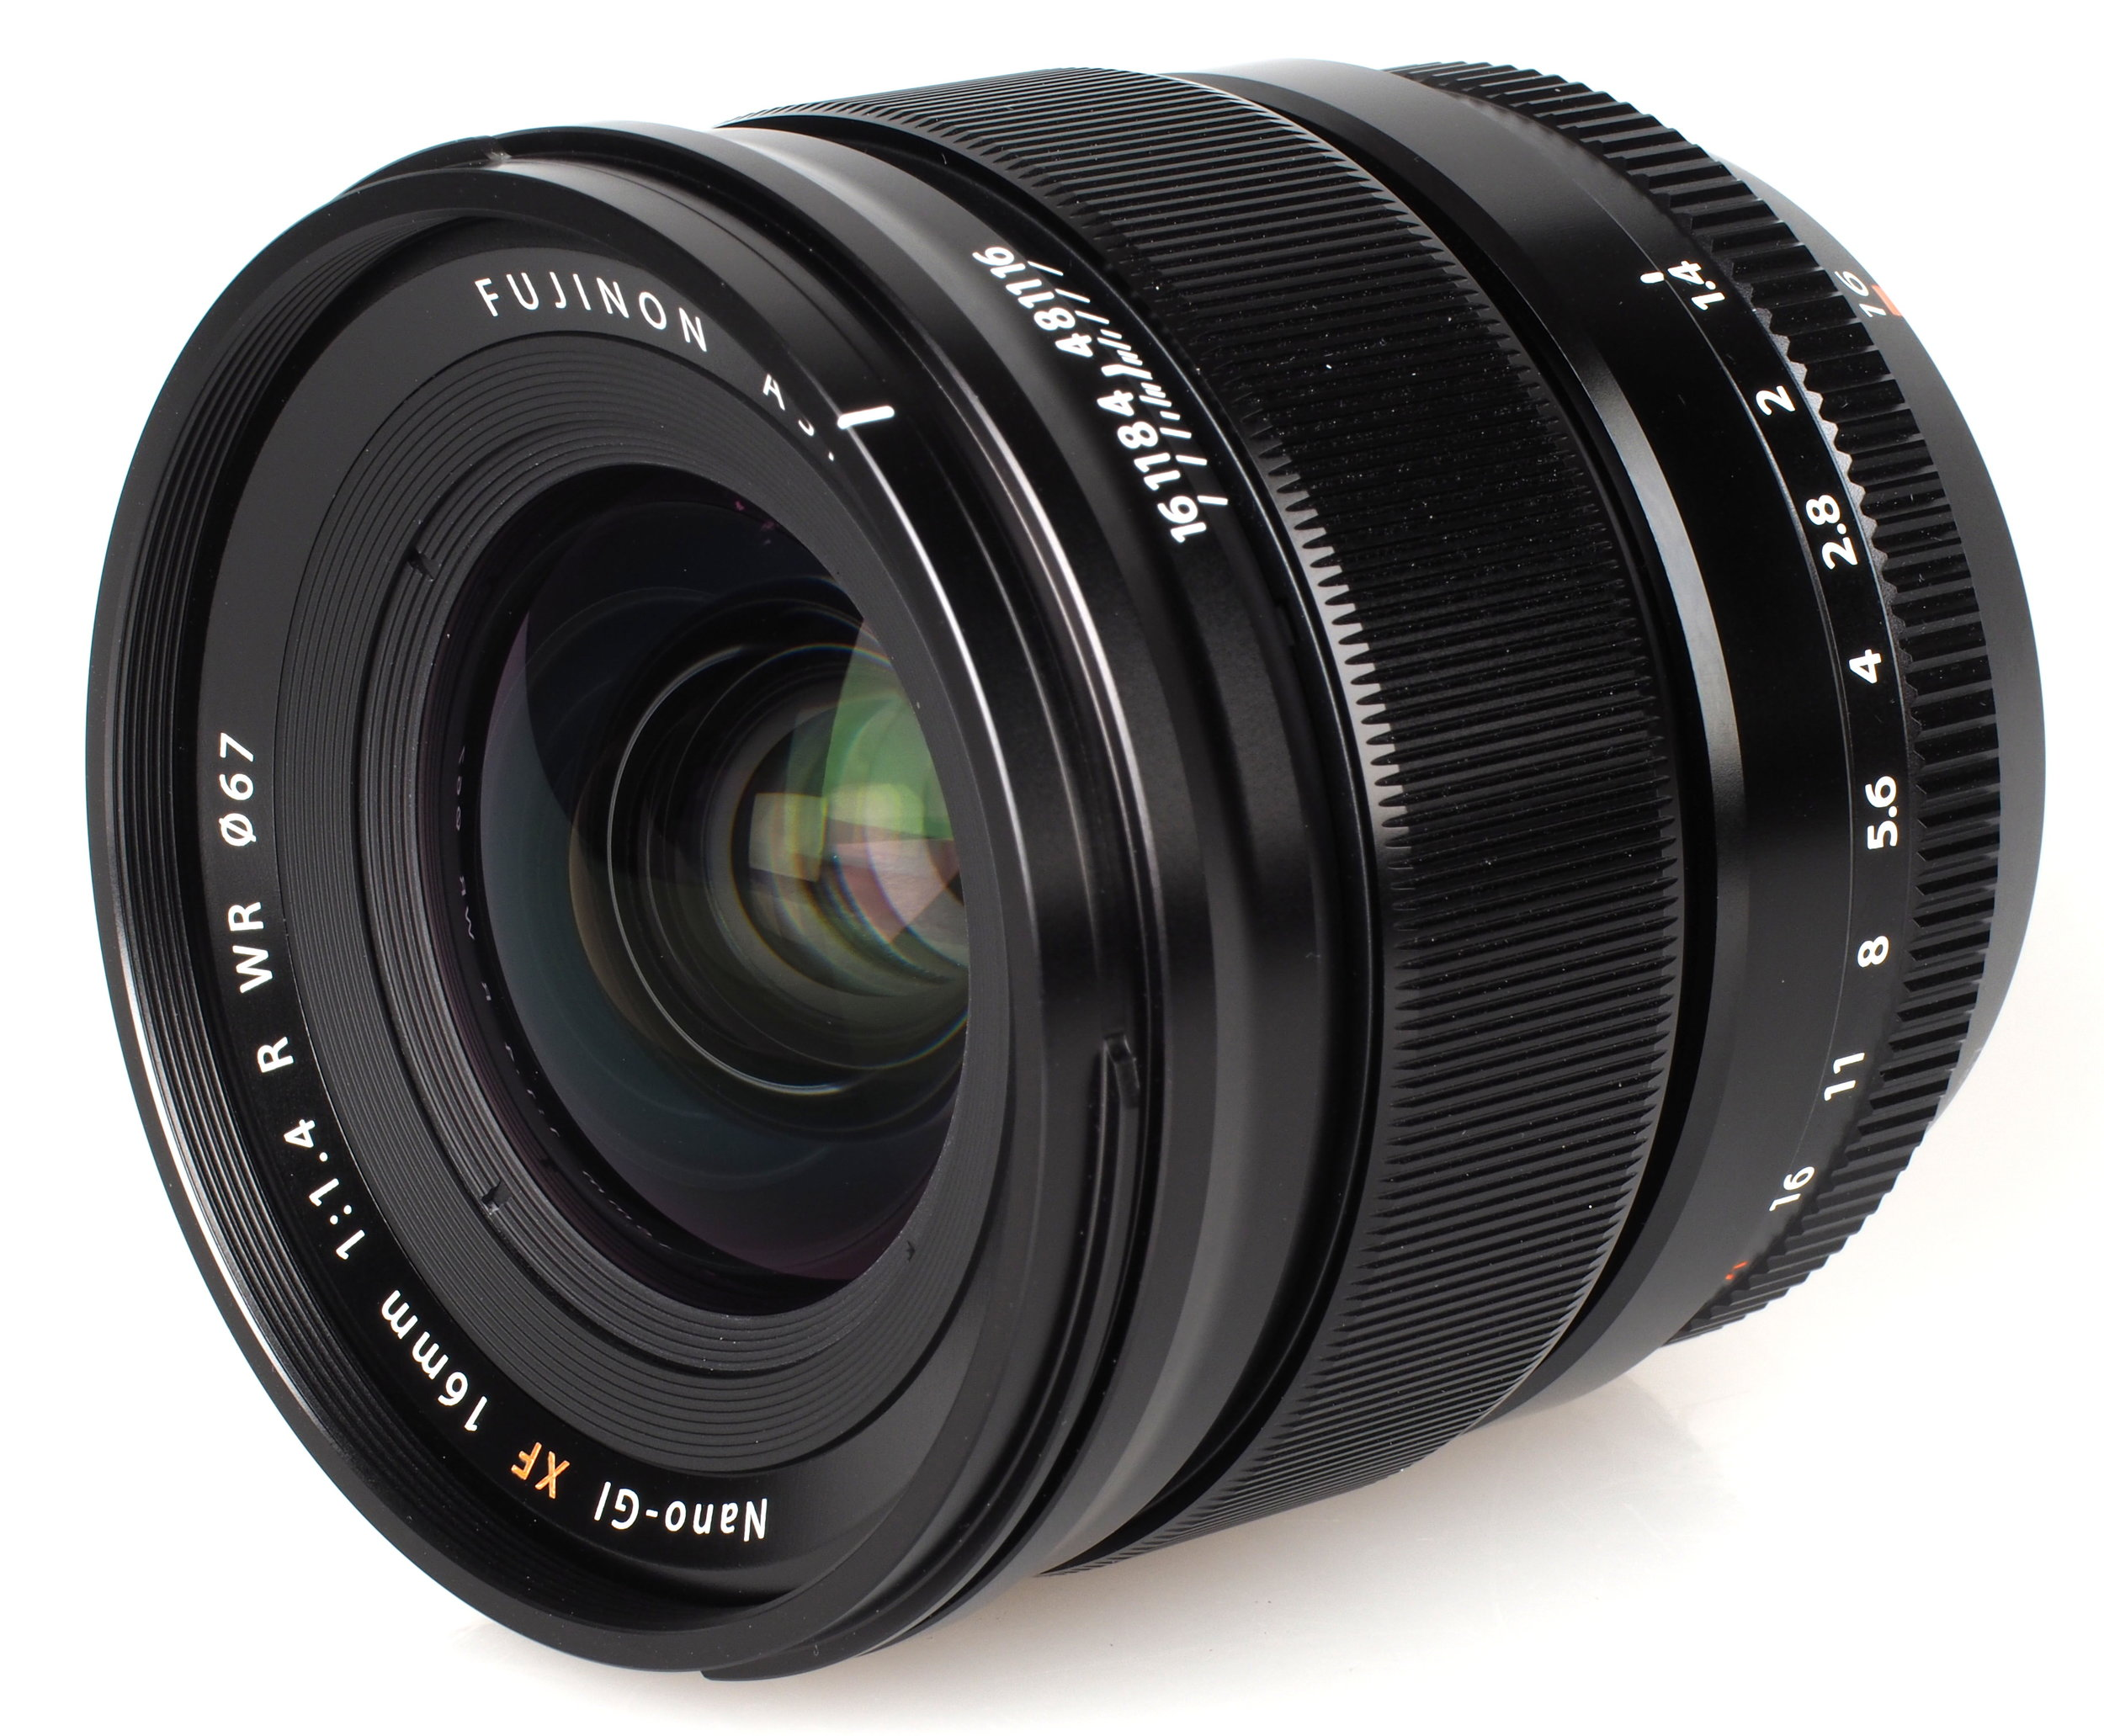 highres-Fujifilm-Fujinon-16mm-f1-4-x-mount-6_1435323608.jpg